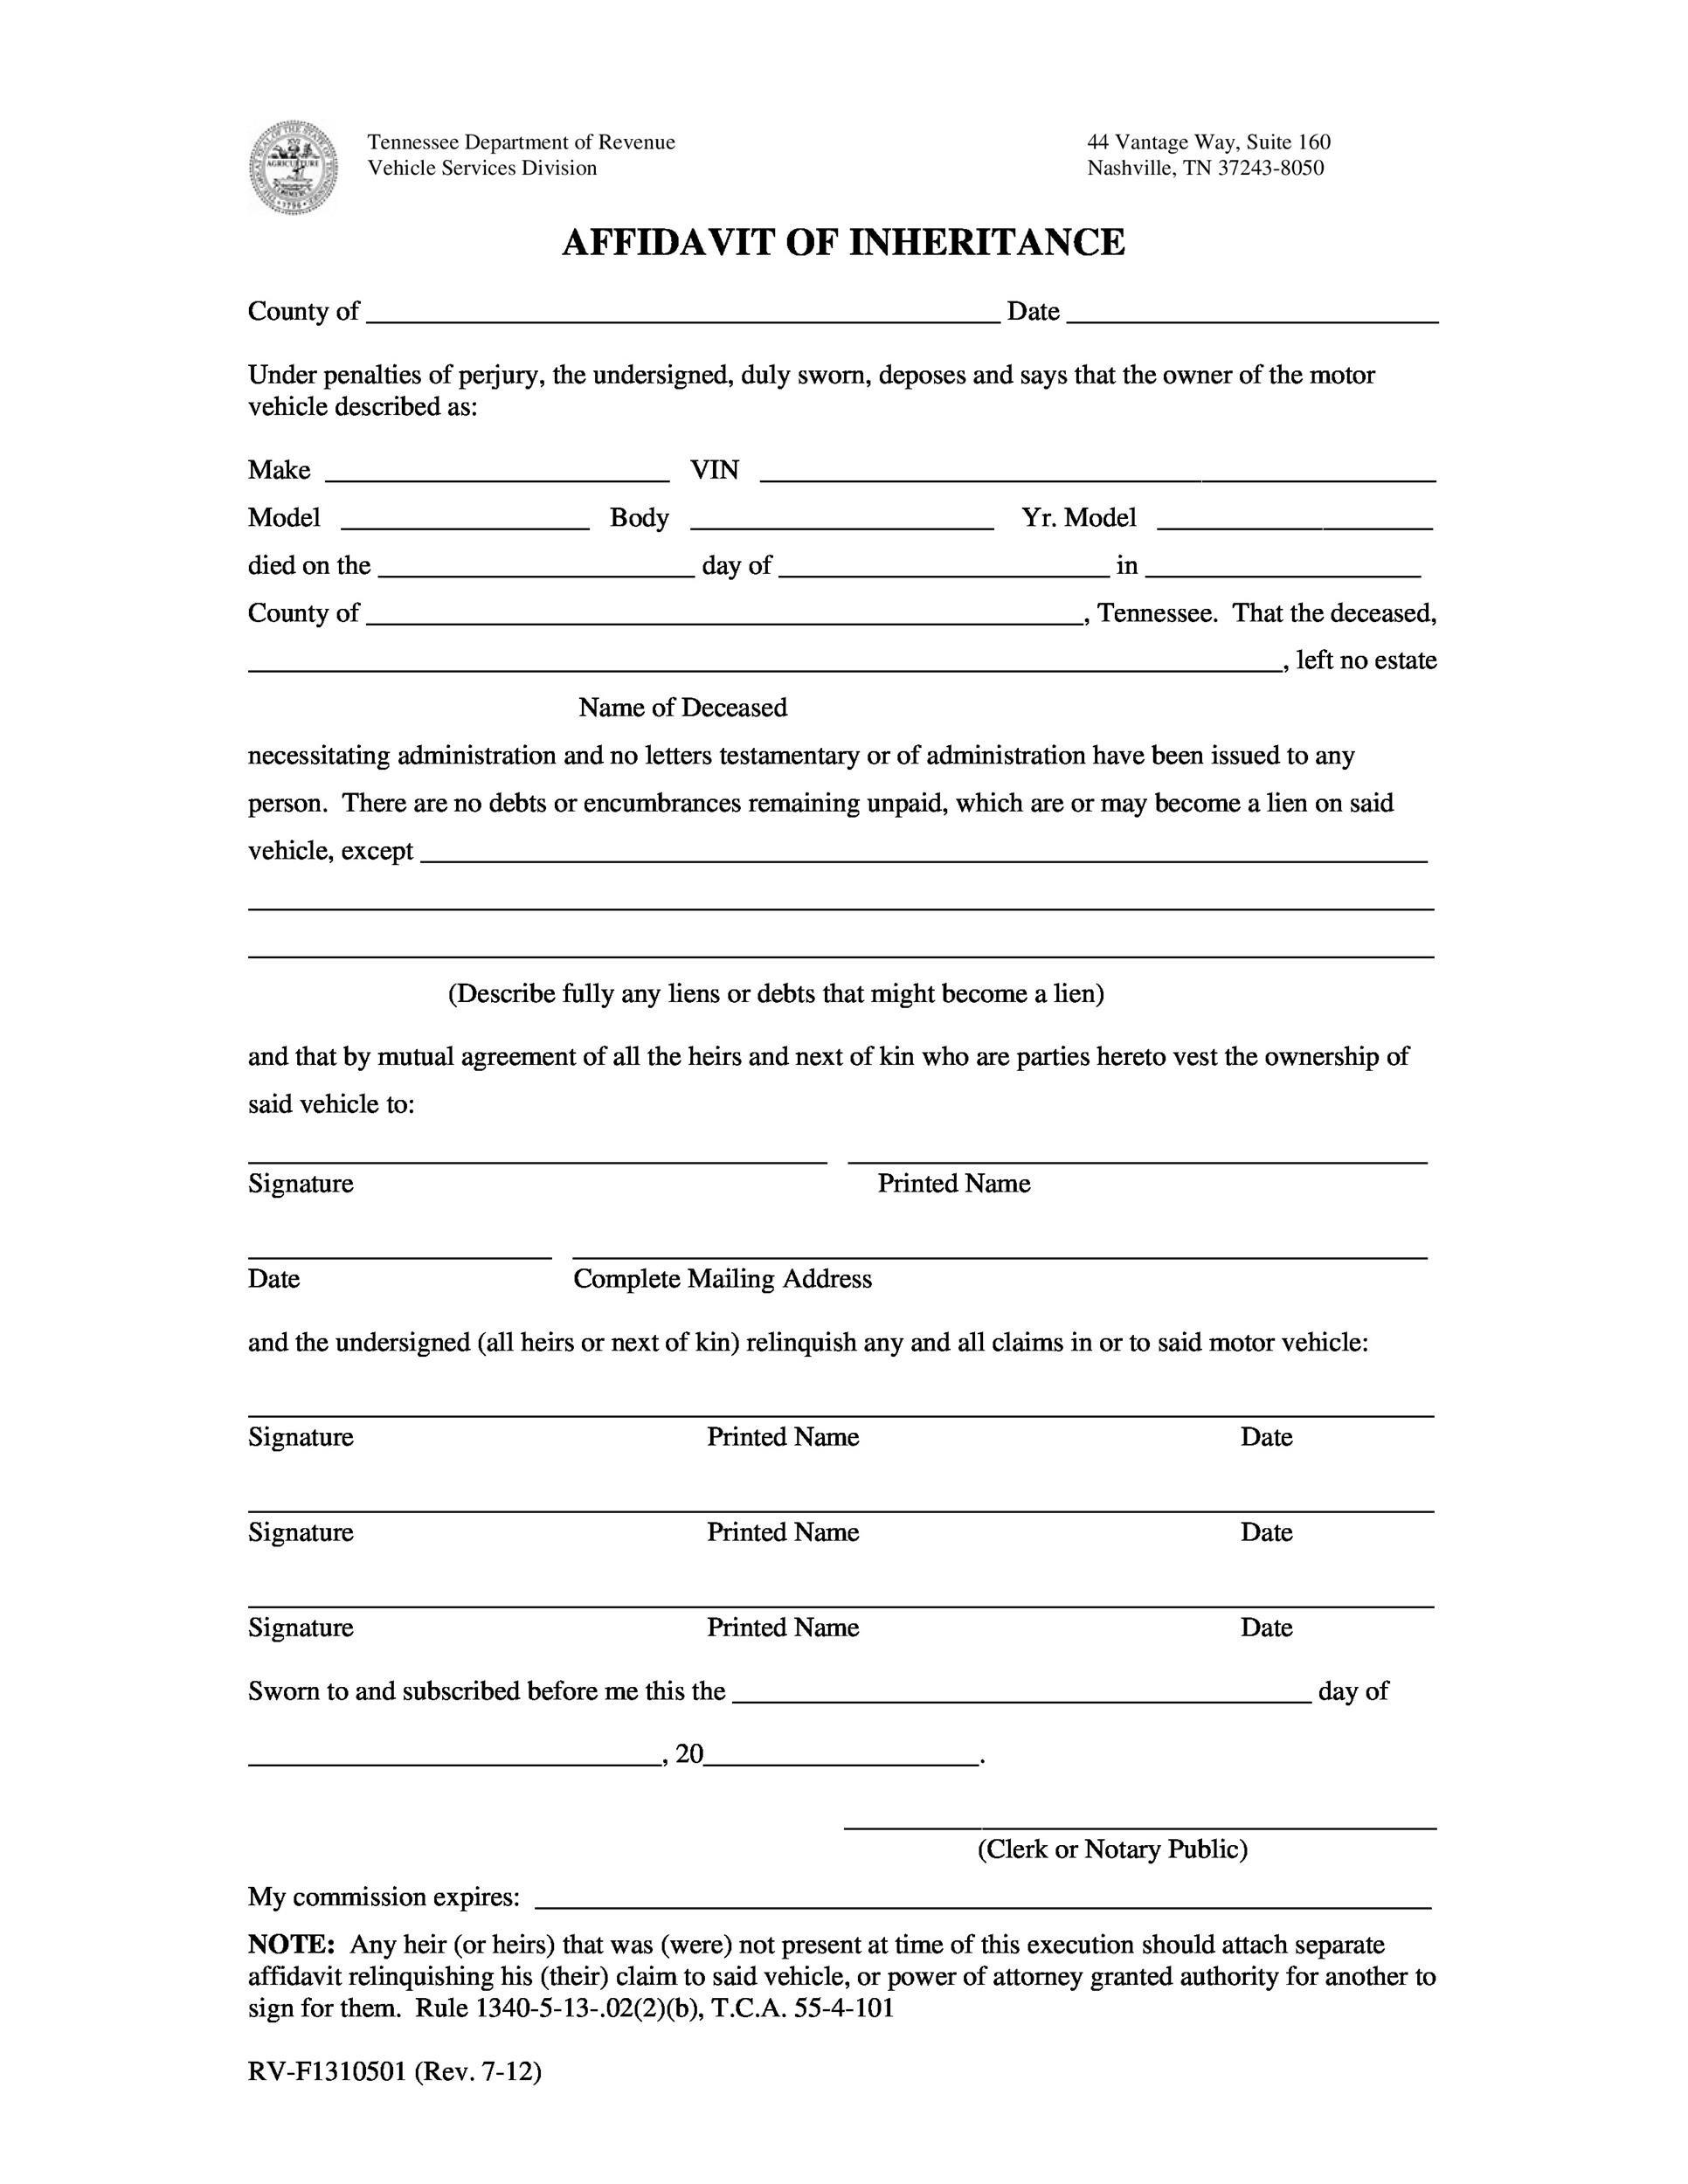 Doc7301000 Affidavit of Facts Template Affidavit Of Fact – Affidavit Template Doc